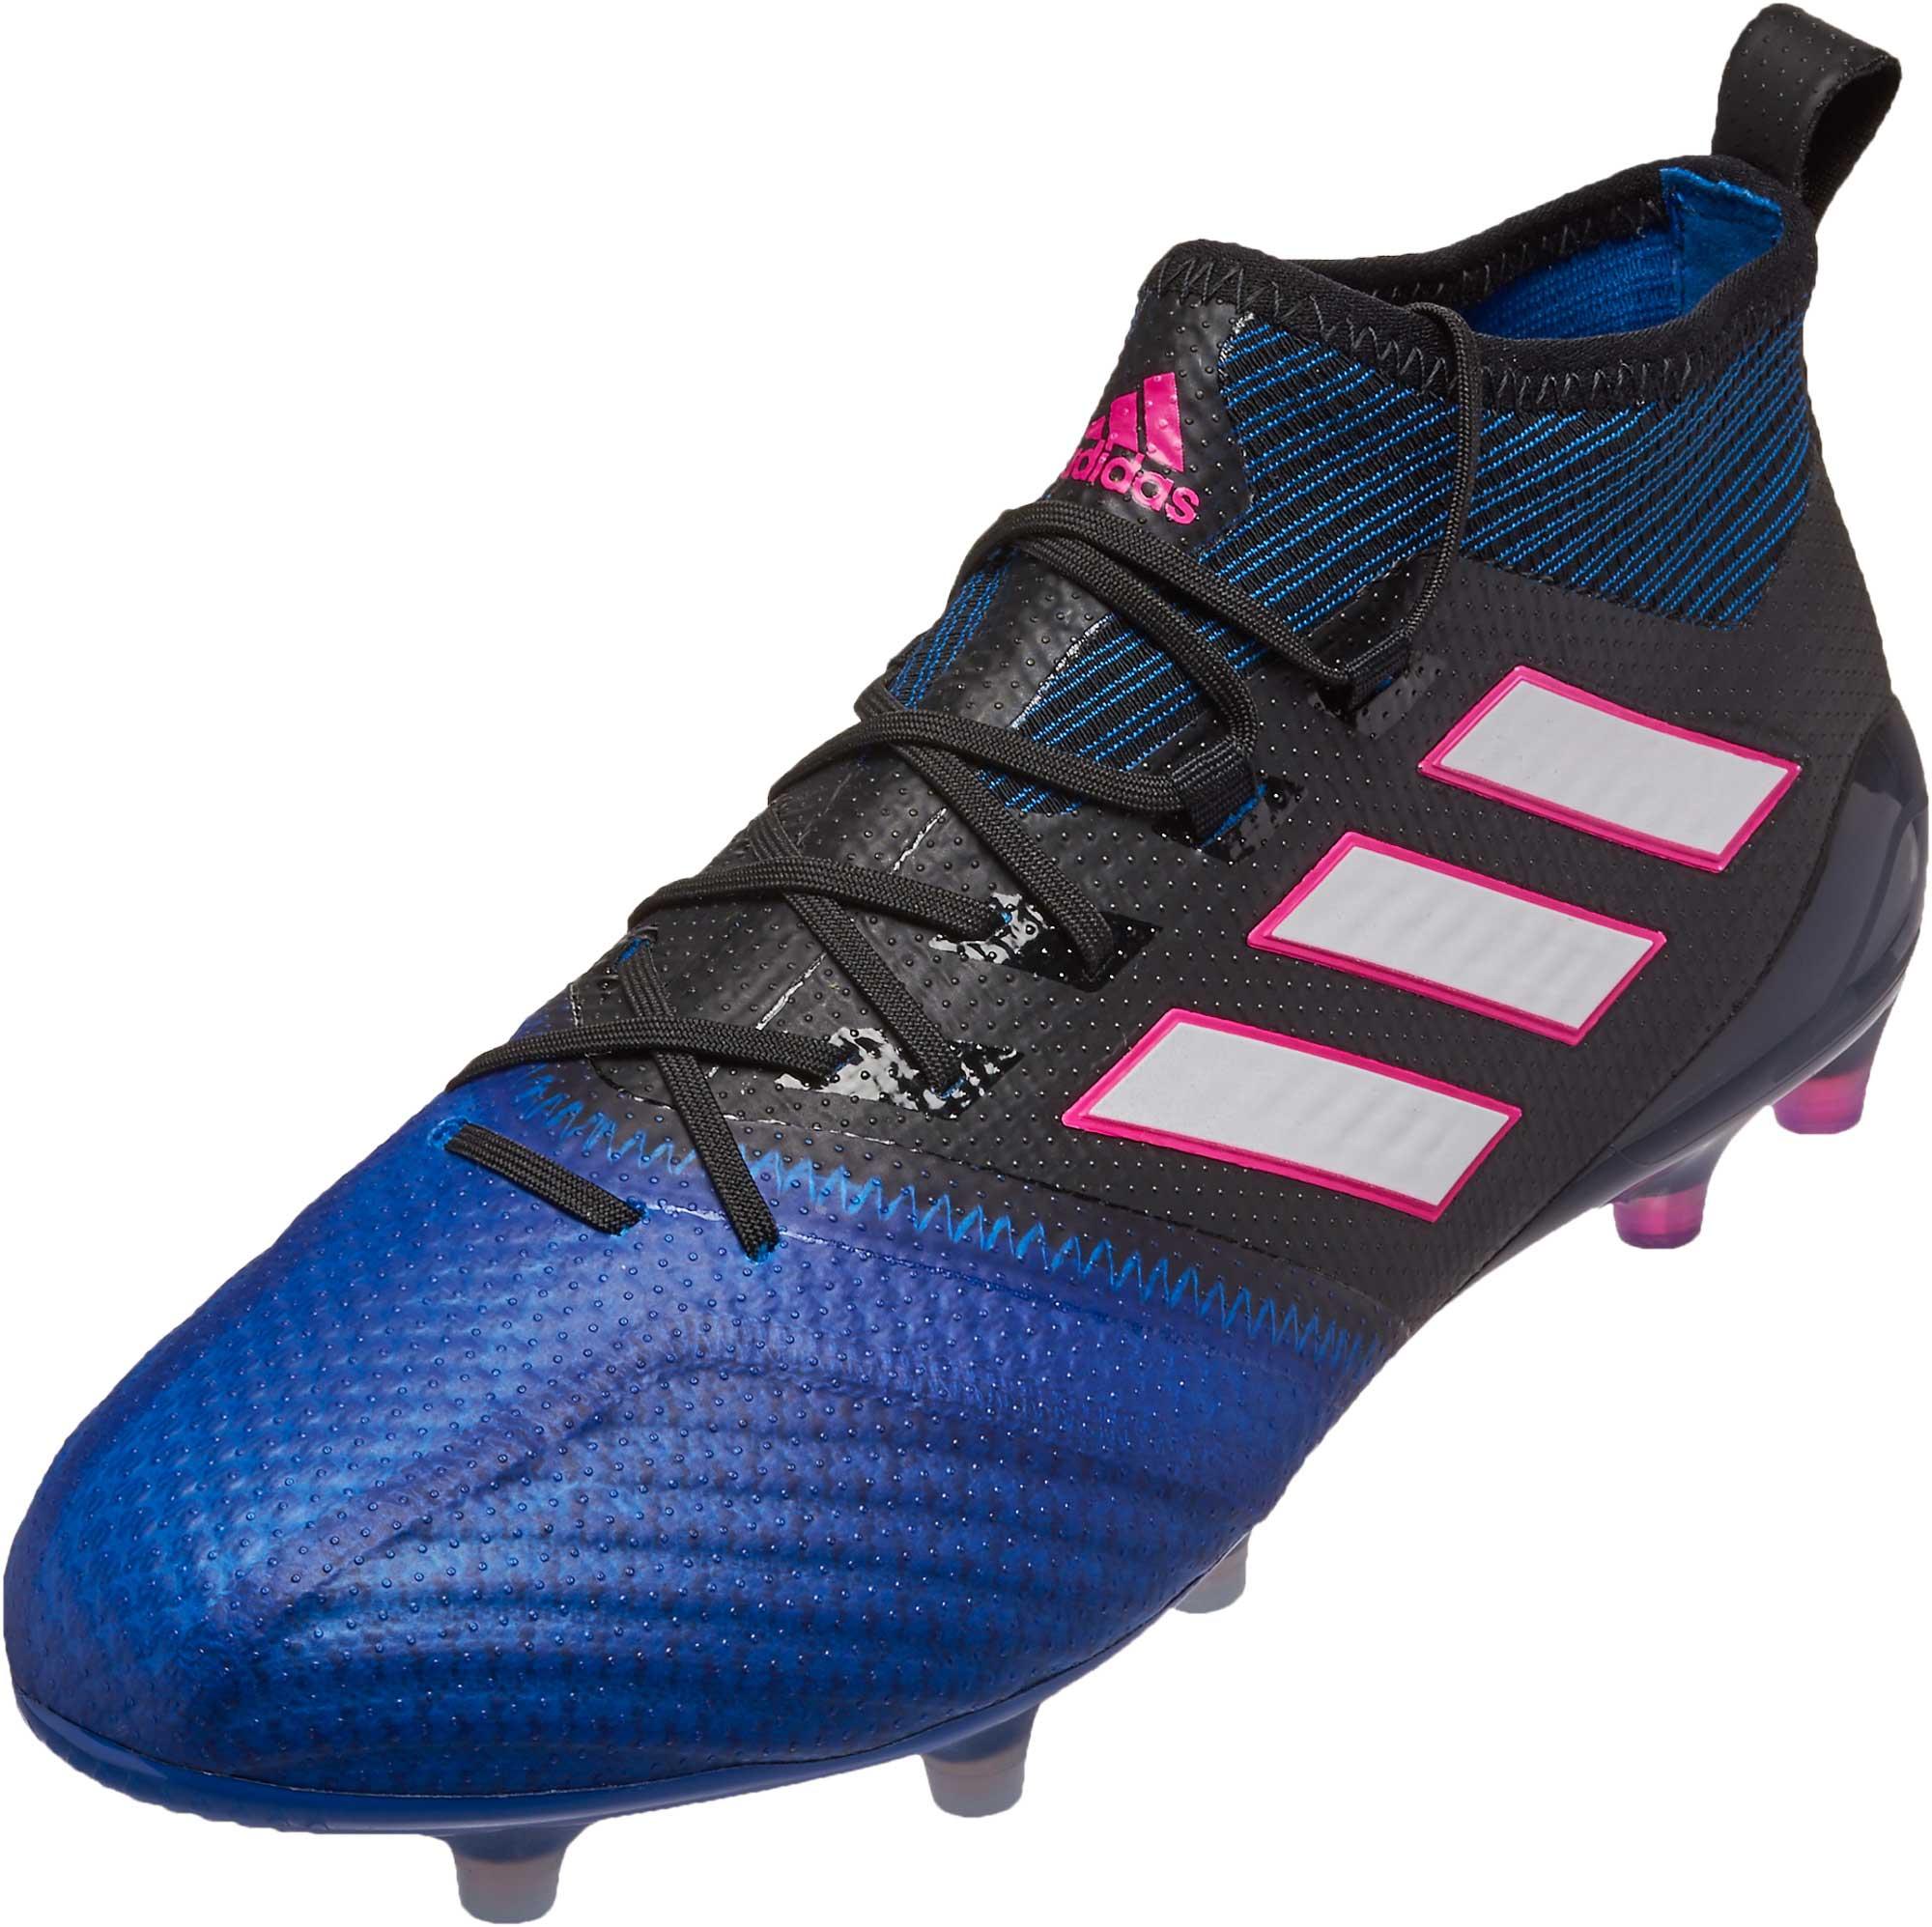 100% authentic 75ab0 75651 adidas ACE 17.1 Primeknit FG - Black & Blue - Soccer Master